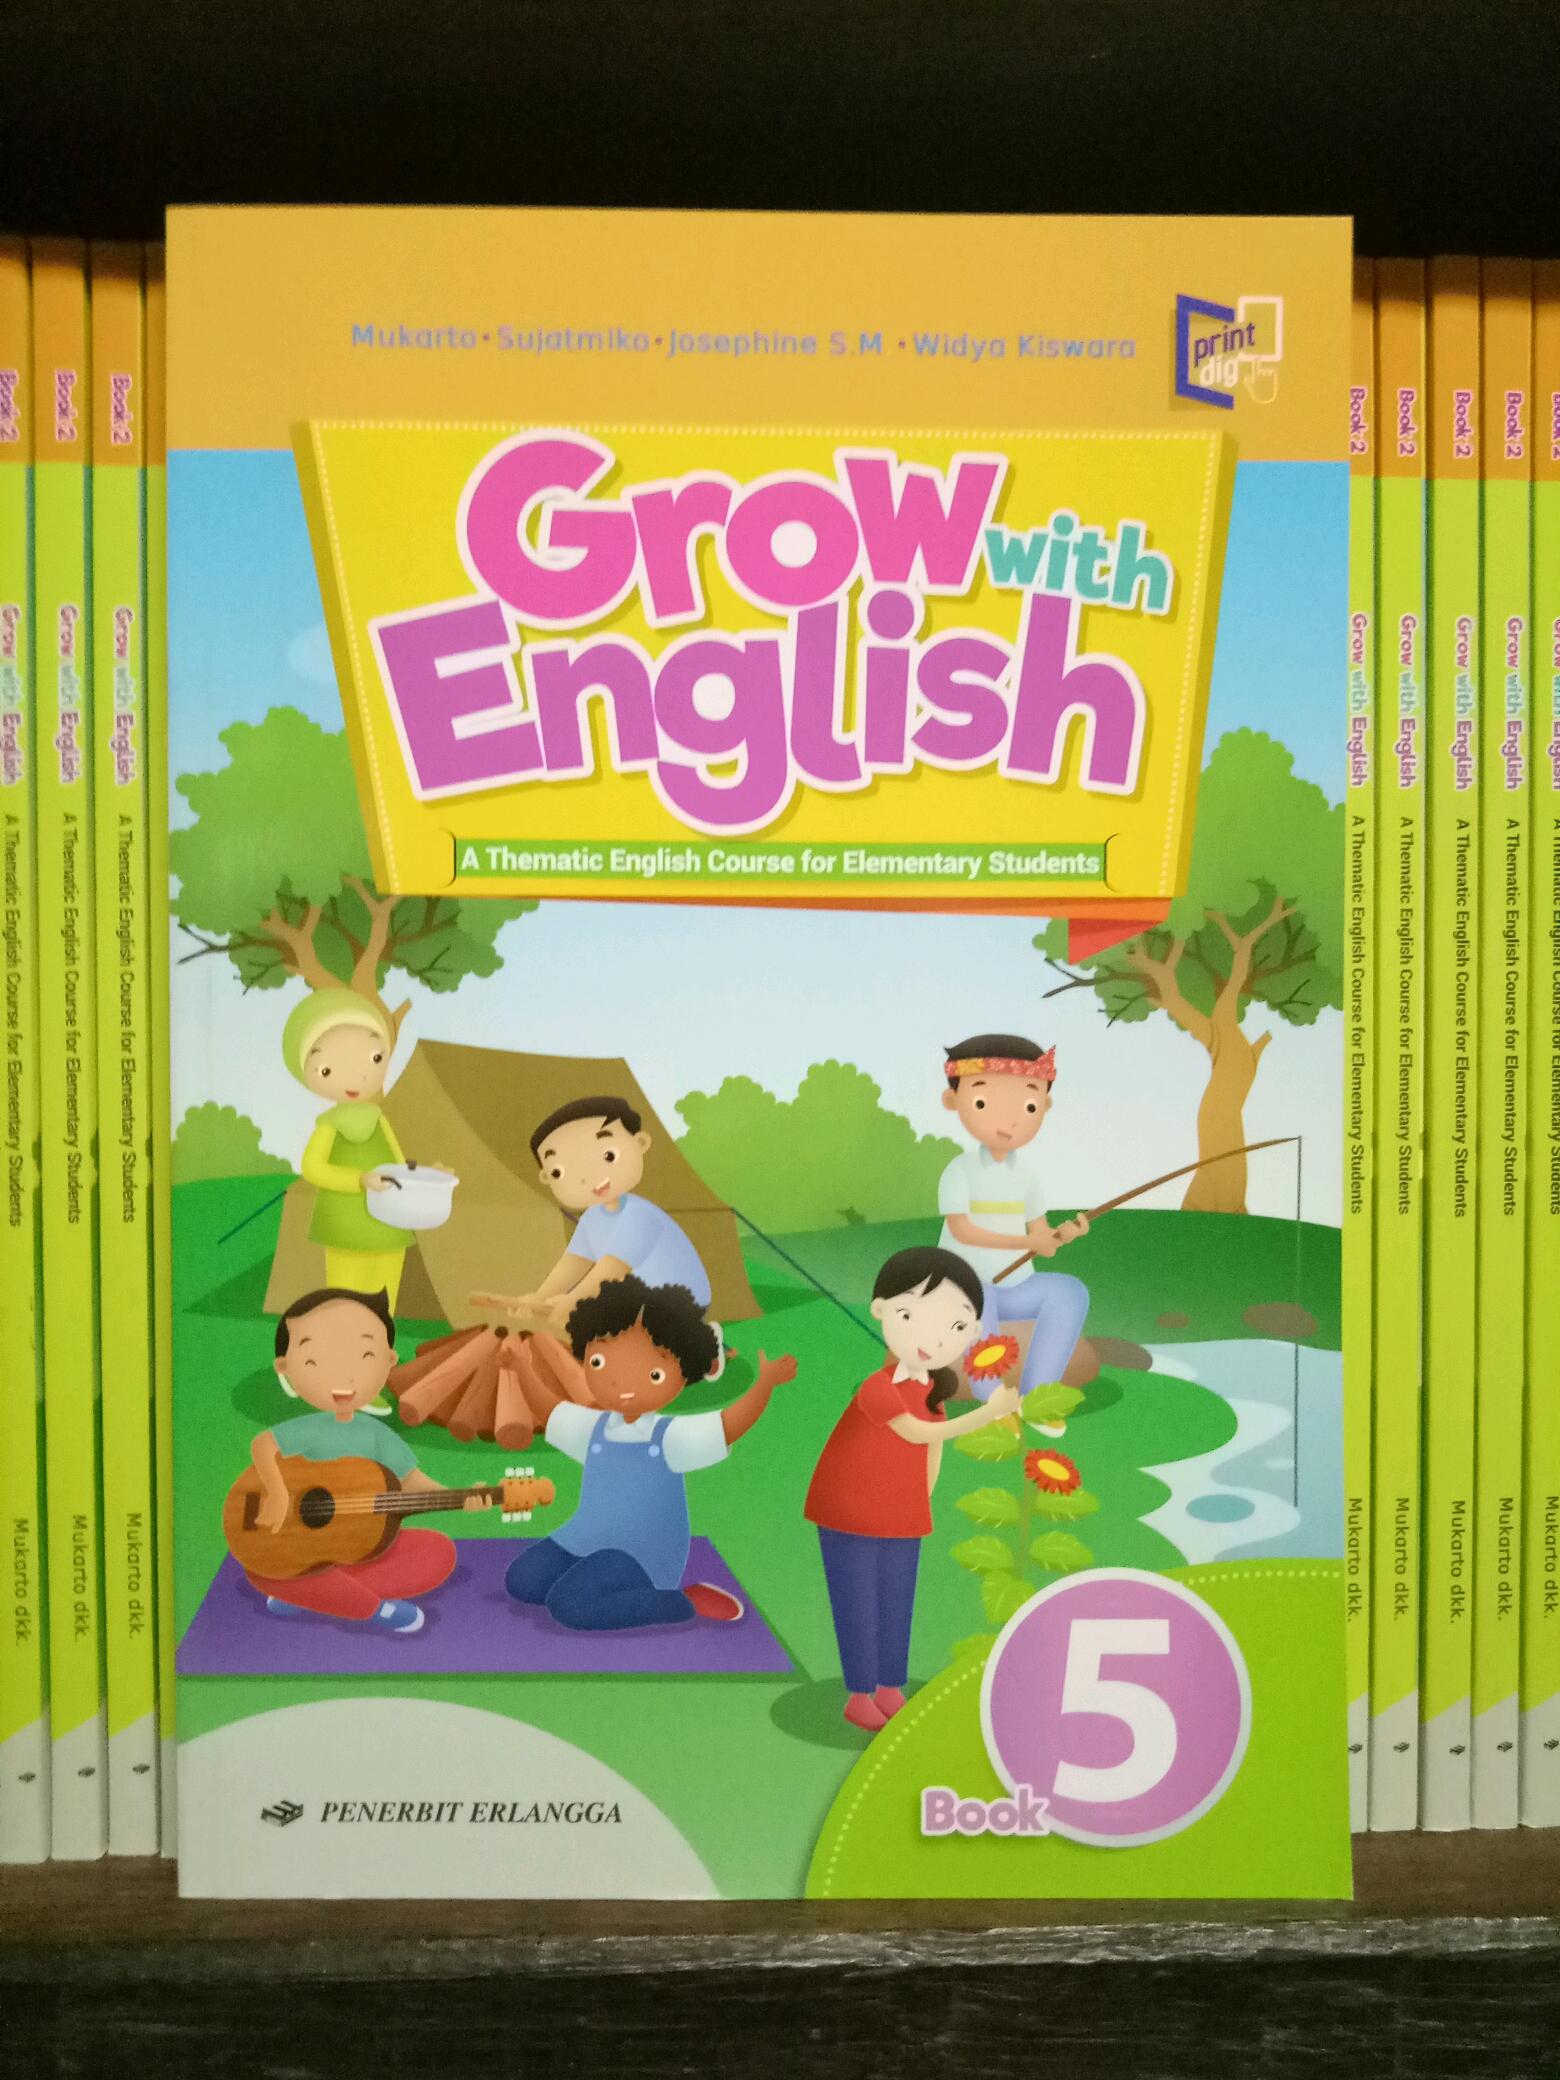 Rpp plbj kelas 1 sd. Download Buku Pkn Kelas 5 Sd Penerbit Erlangga Jawabanku Id